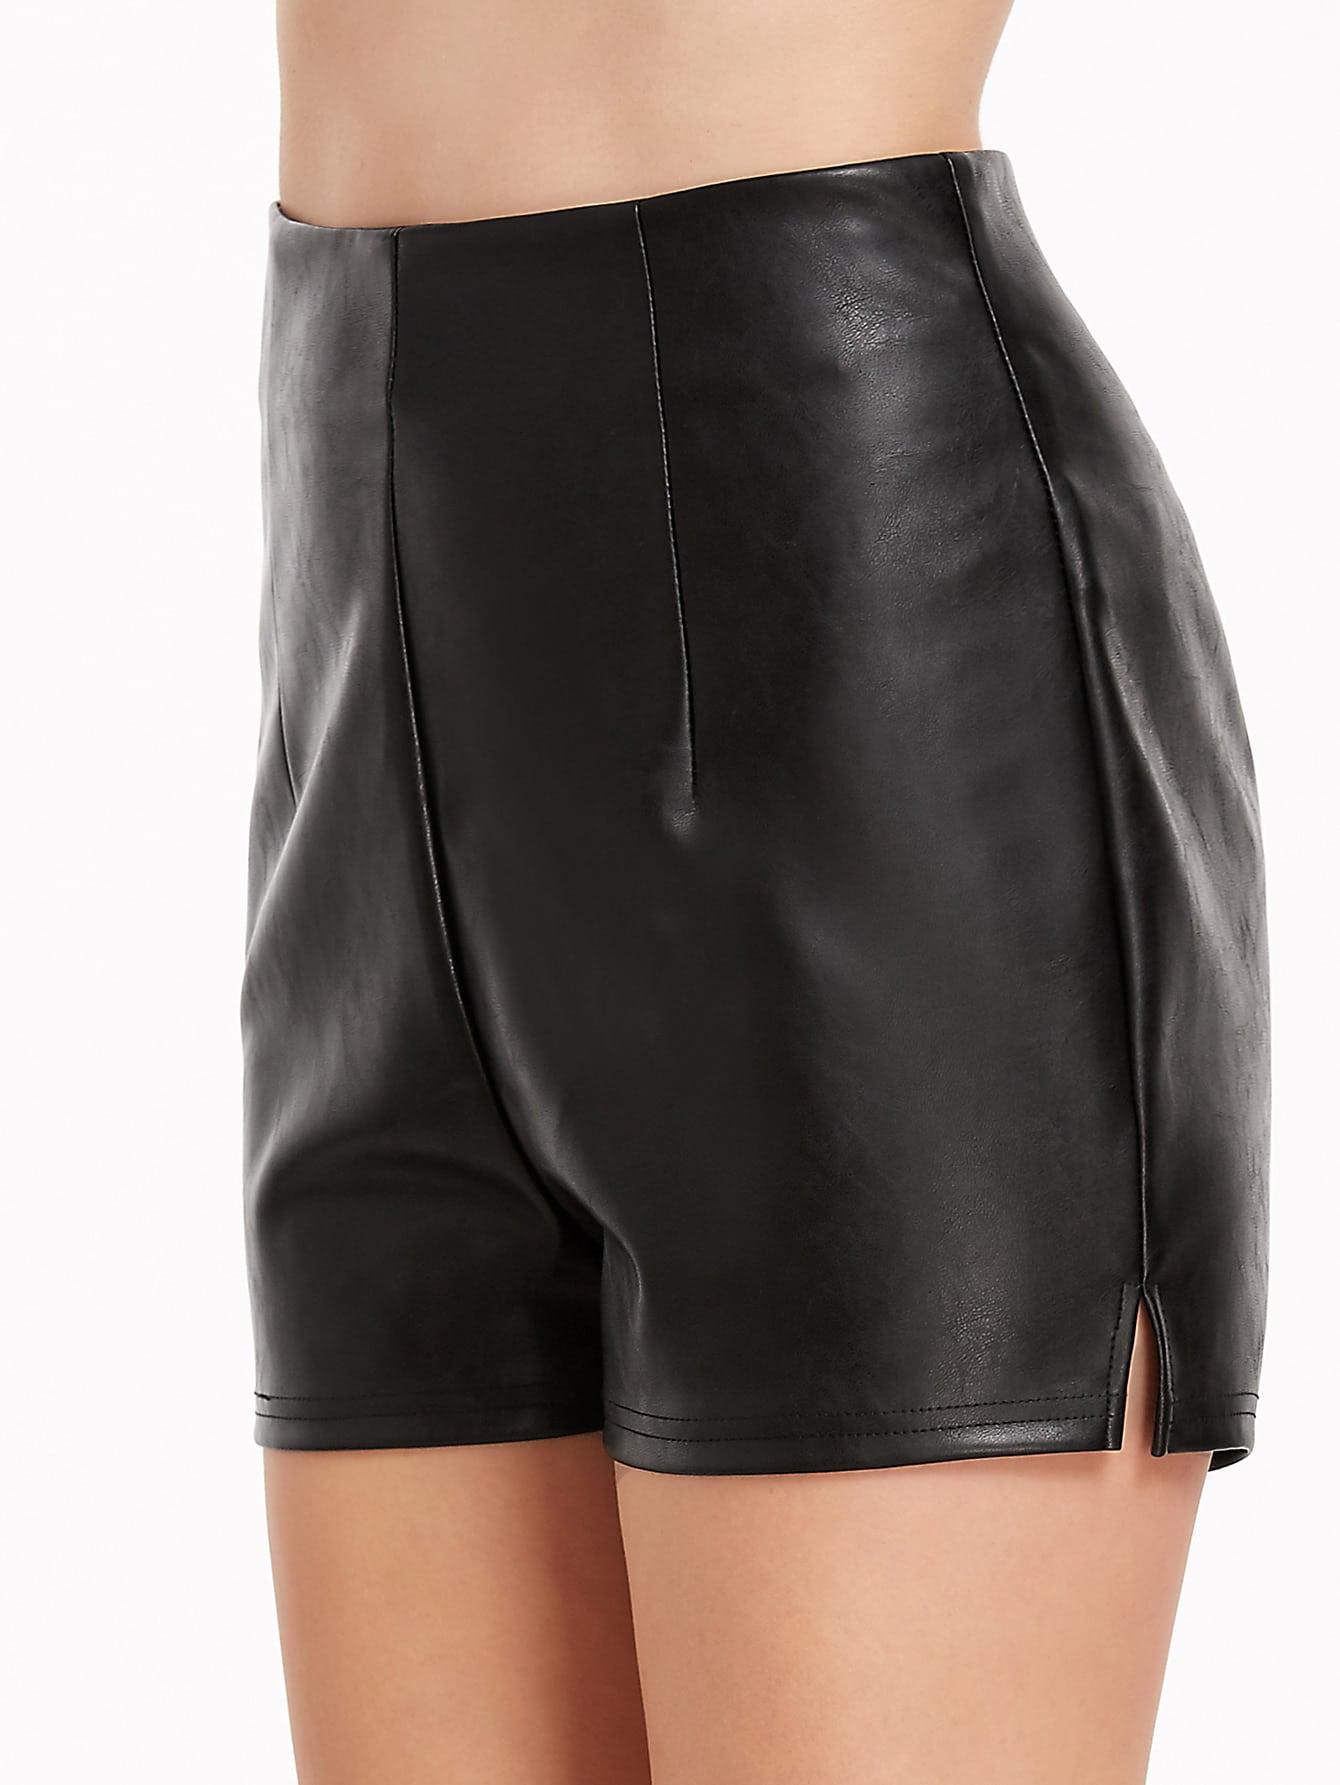 shorts161128701_2